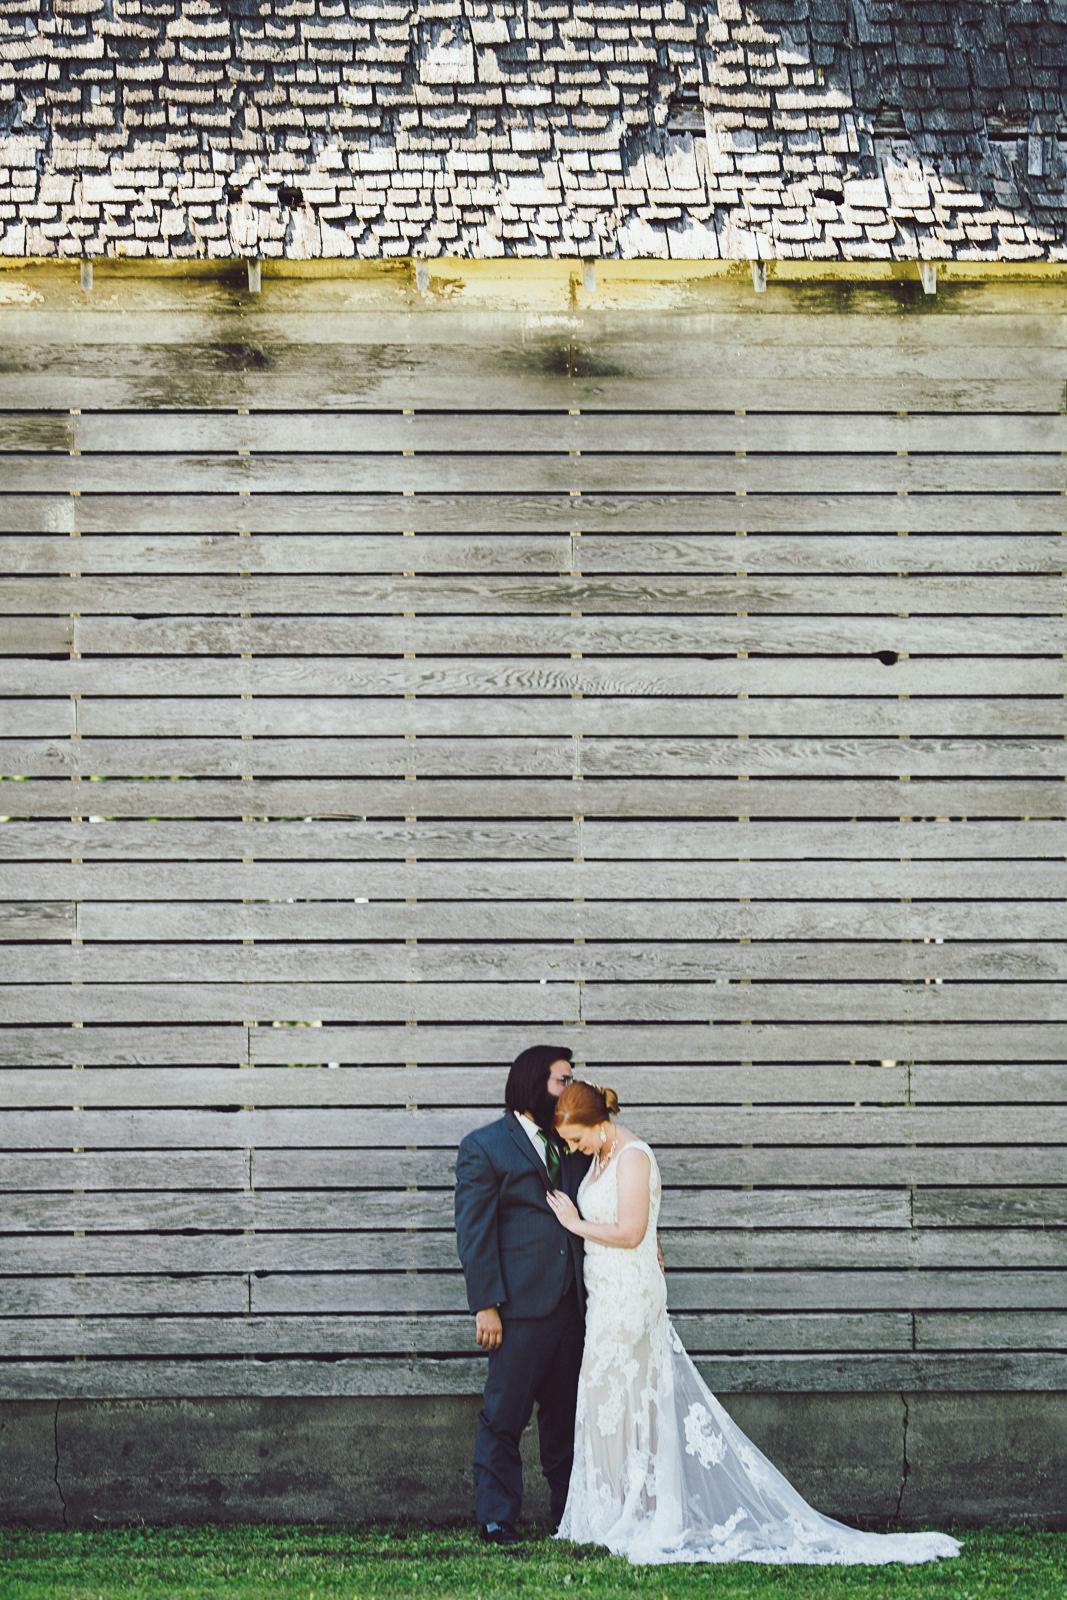 wedding-keely-caleb-355-name-your-photo.jpg